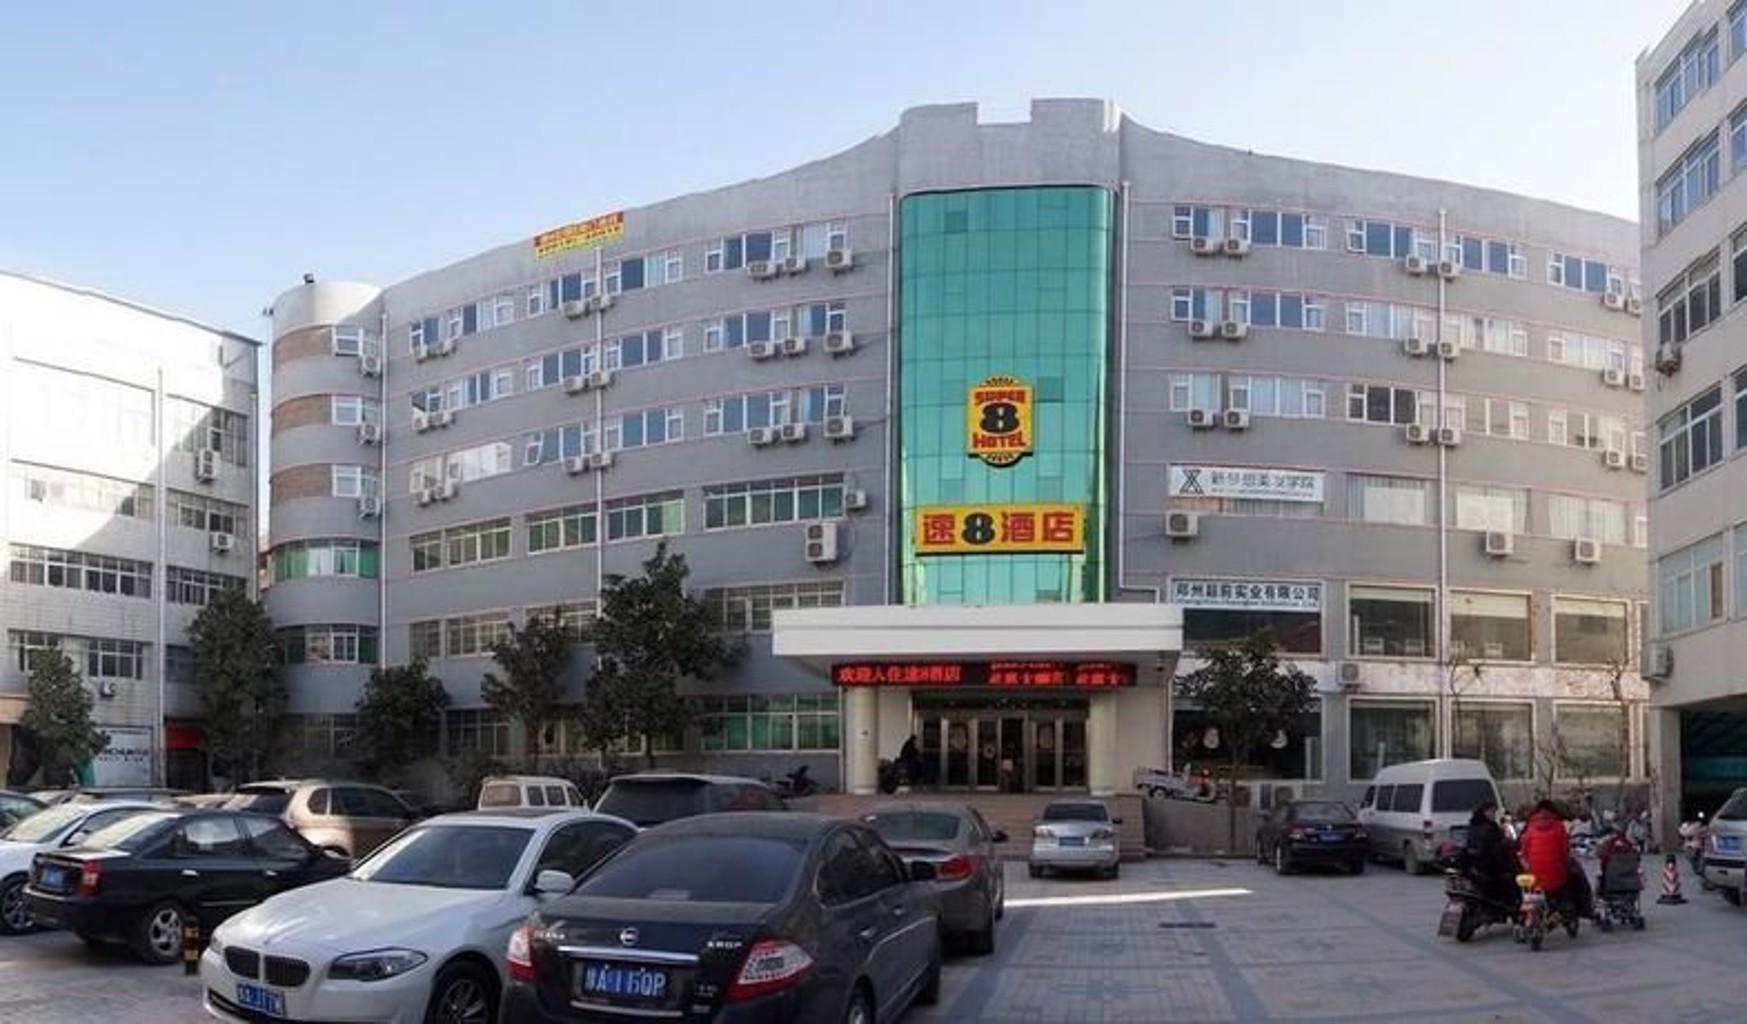 Gallery image of Super 8 Hotel Zhengzhou Weft Four Road